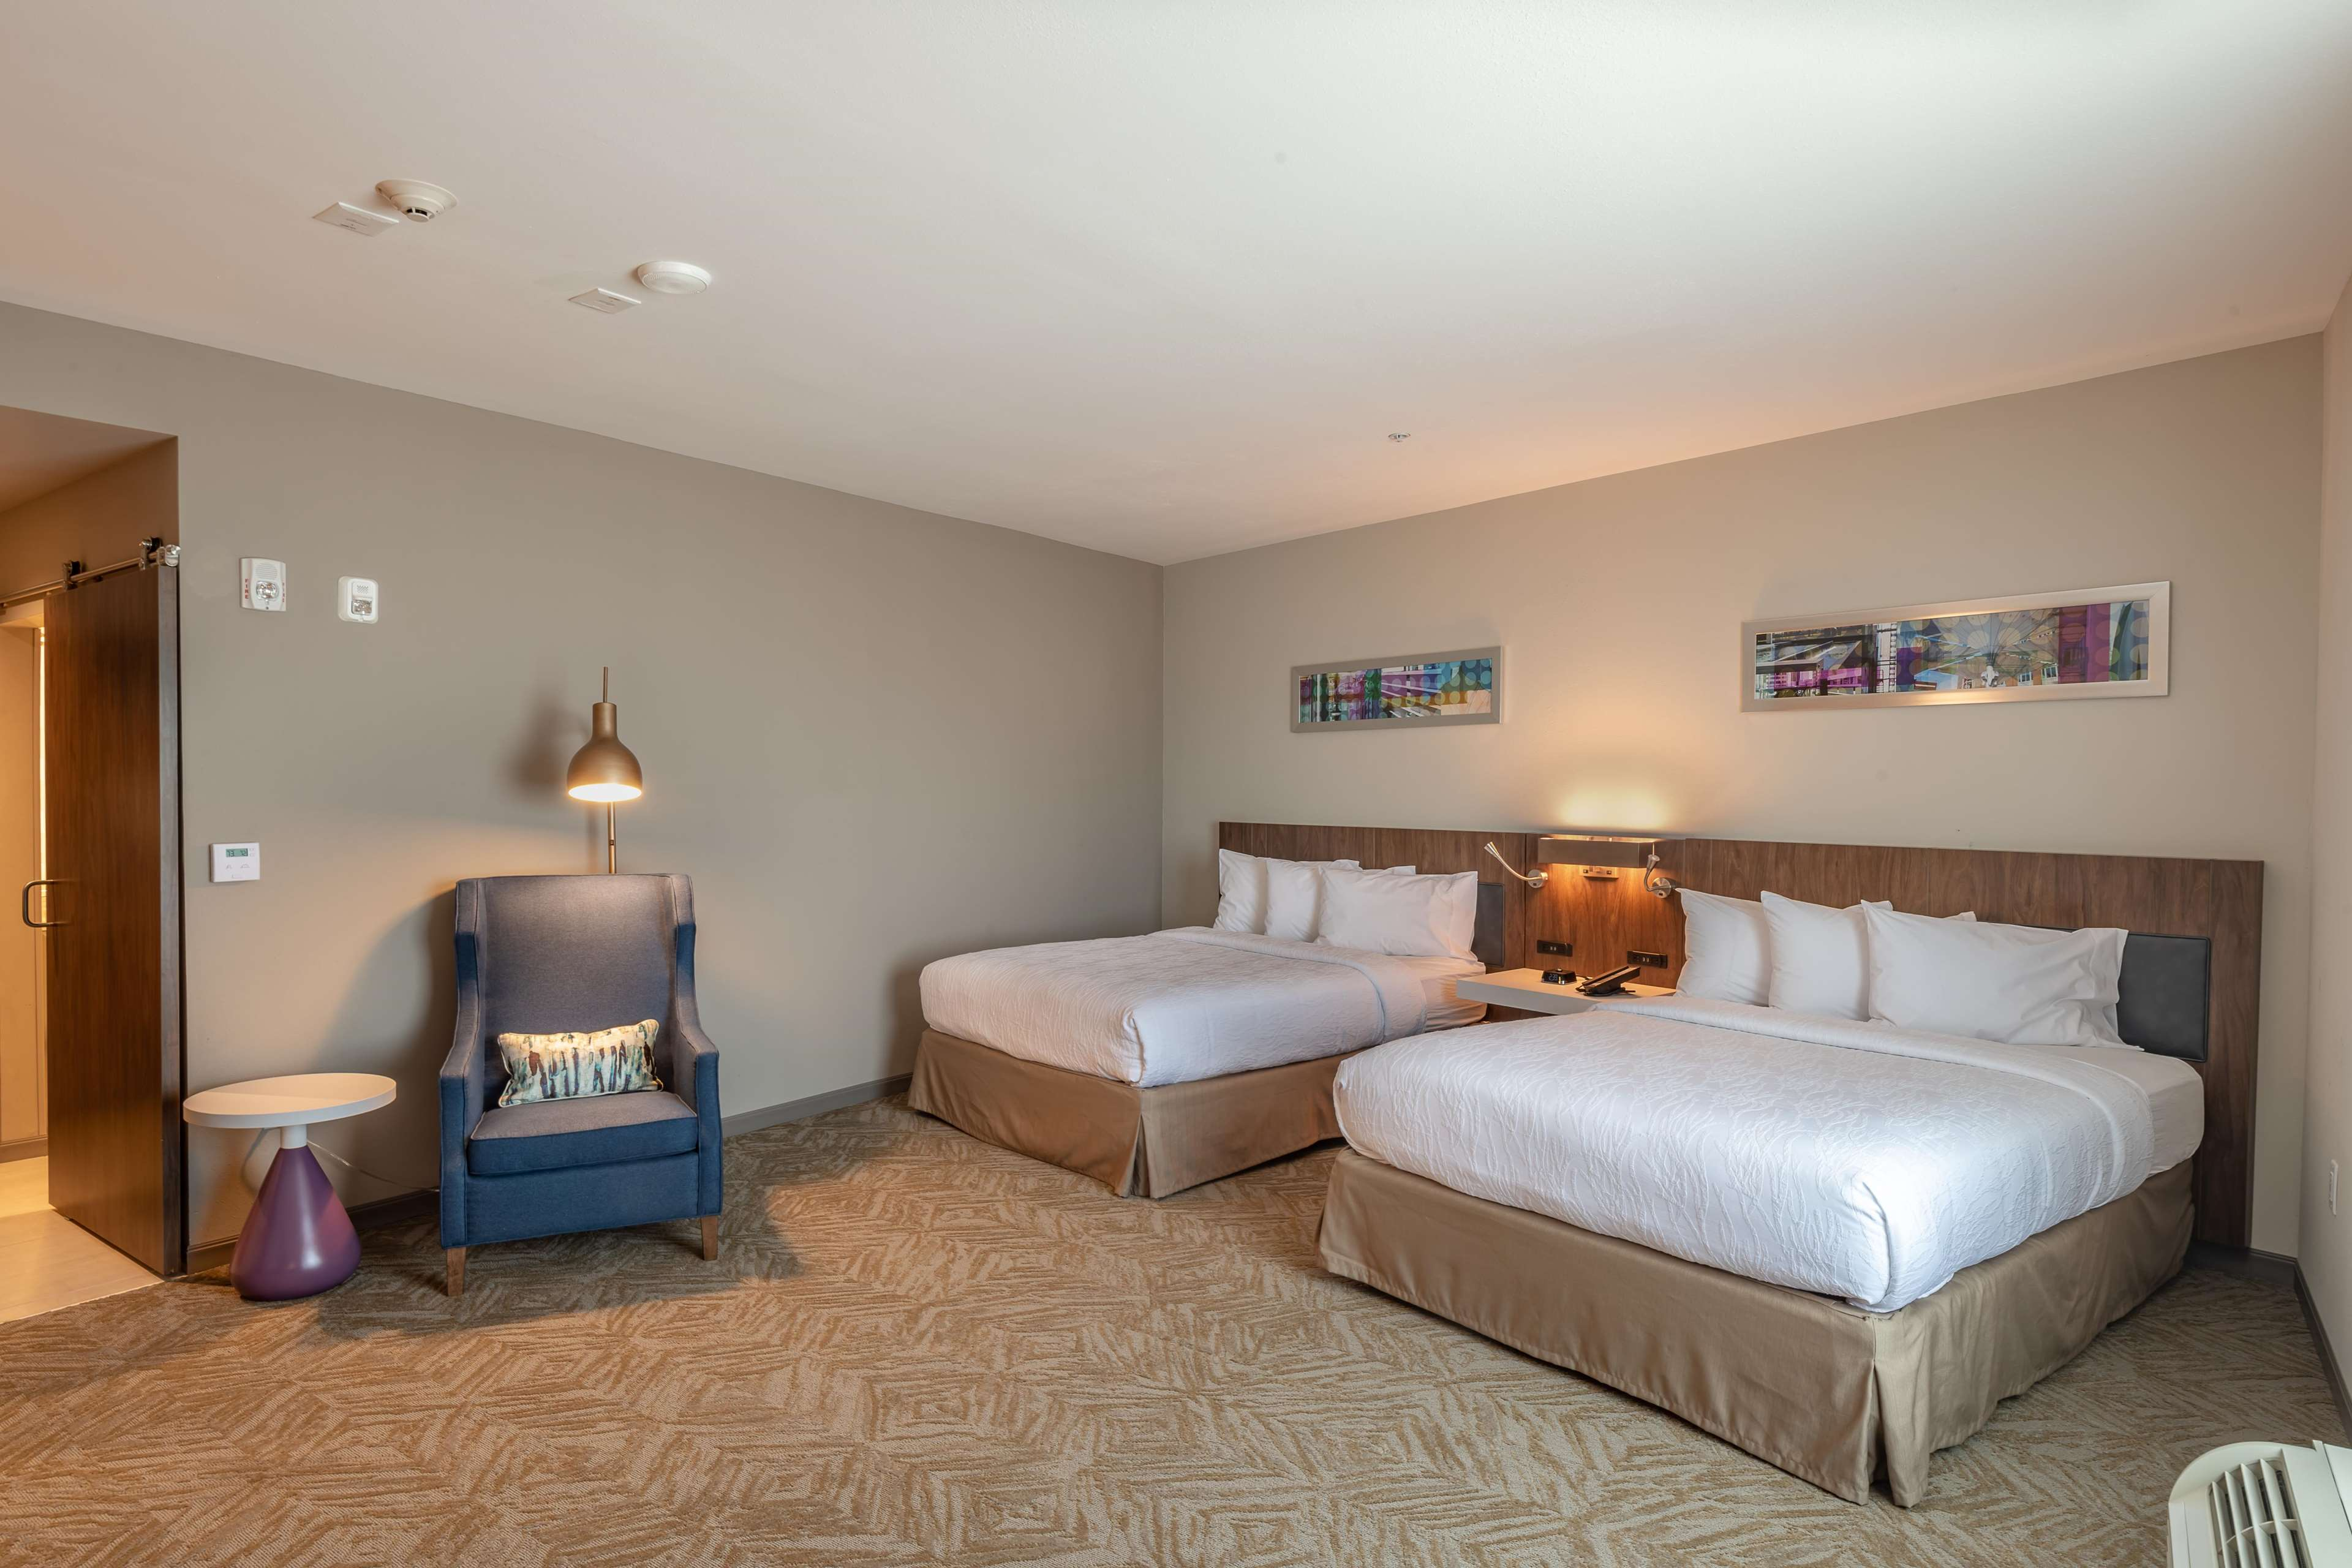 Hilton Garden Inn Dallas at Hurst Conference Center image 19